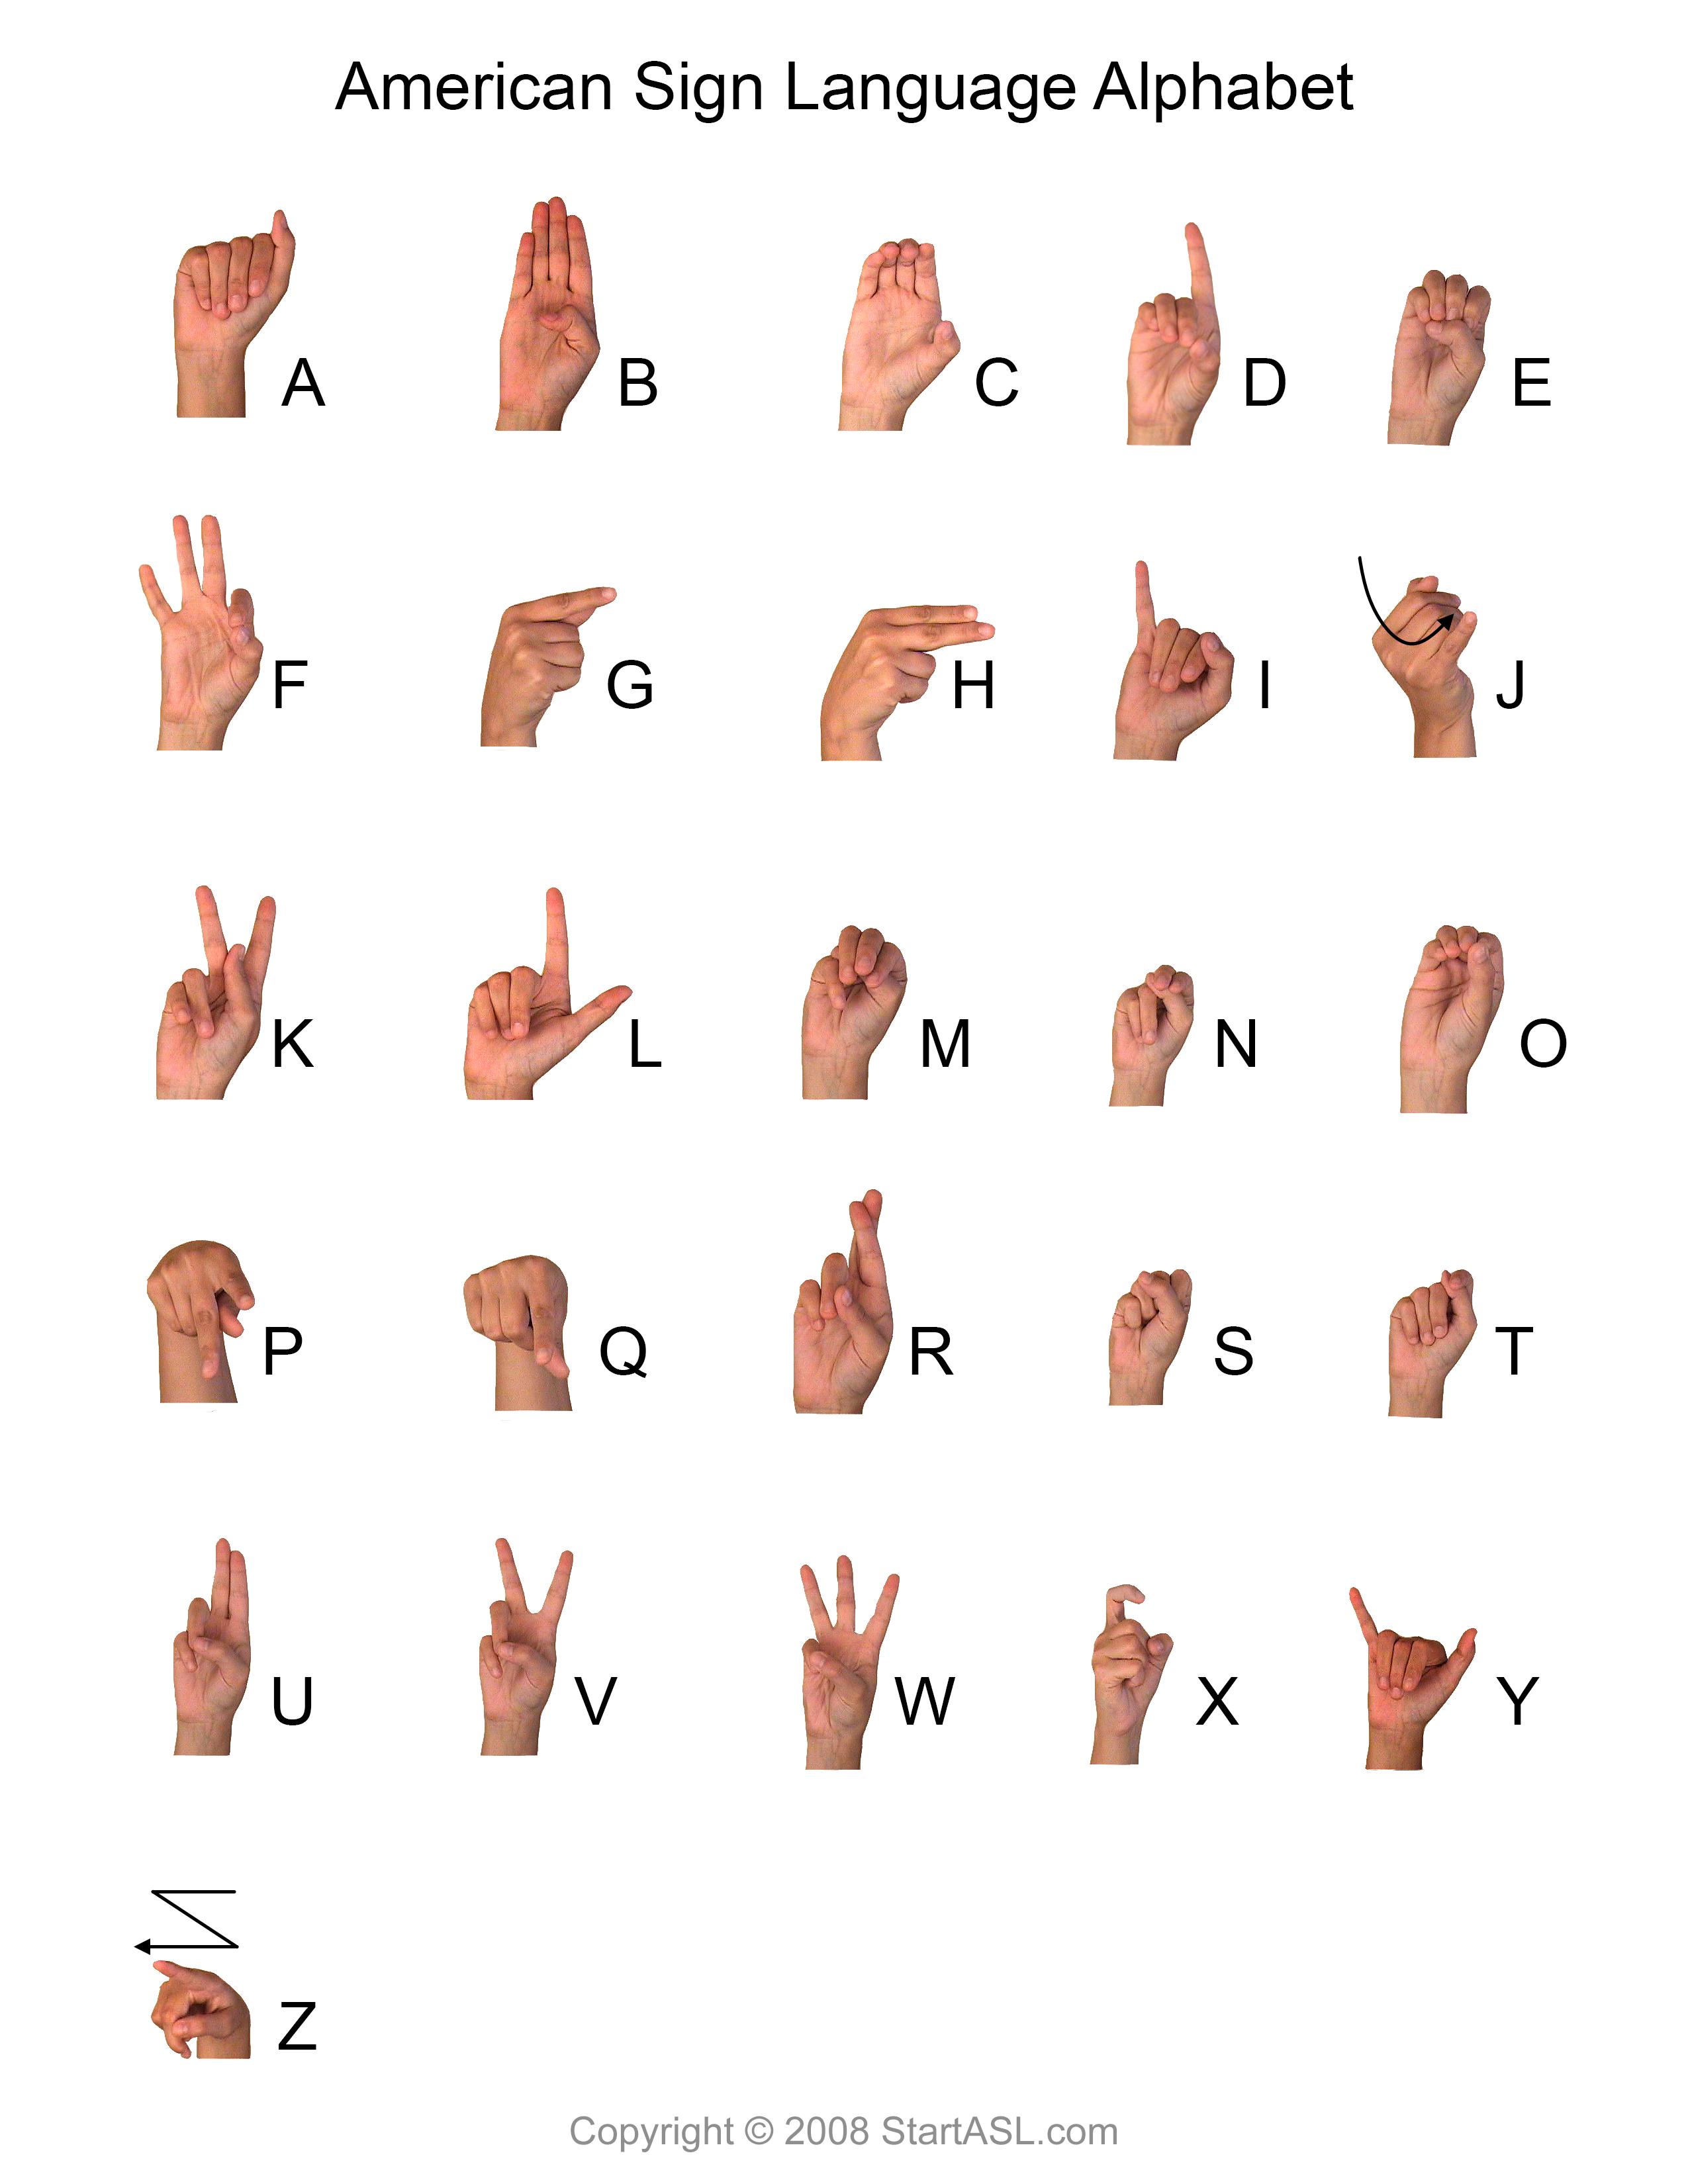 Sign Language Alphabet | 6 Free Downloads To Learn It Fast - Start Asl - Spanish Alphabet Flashcards Free Printable